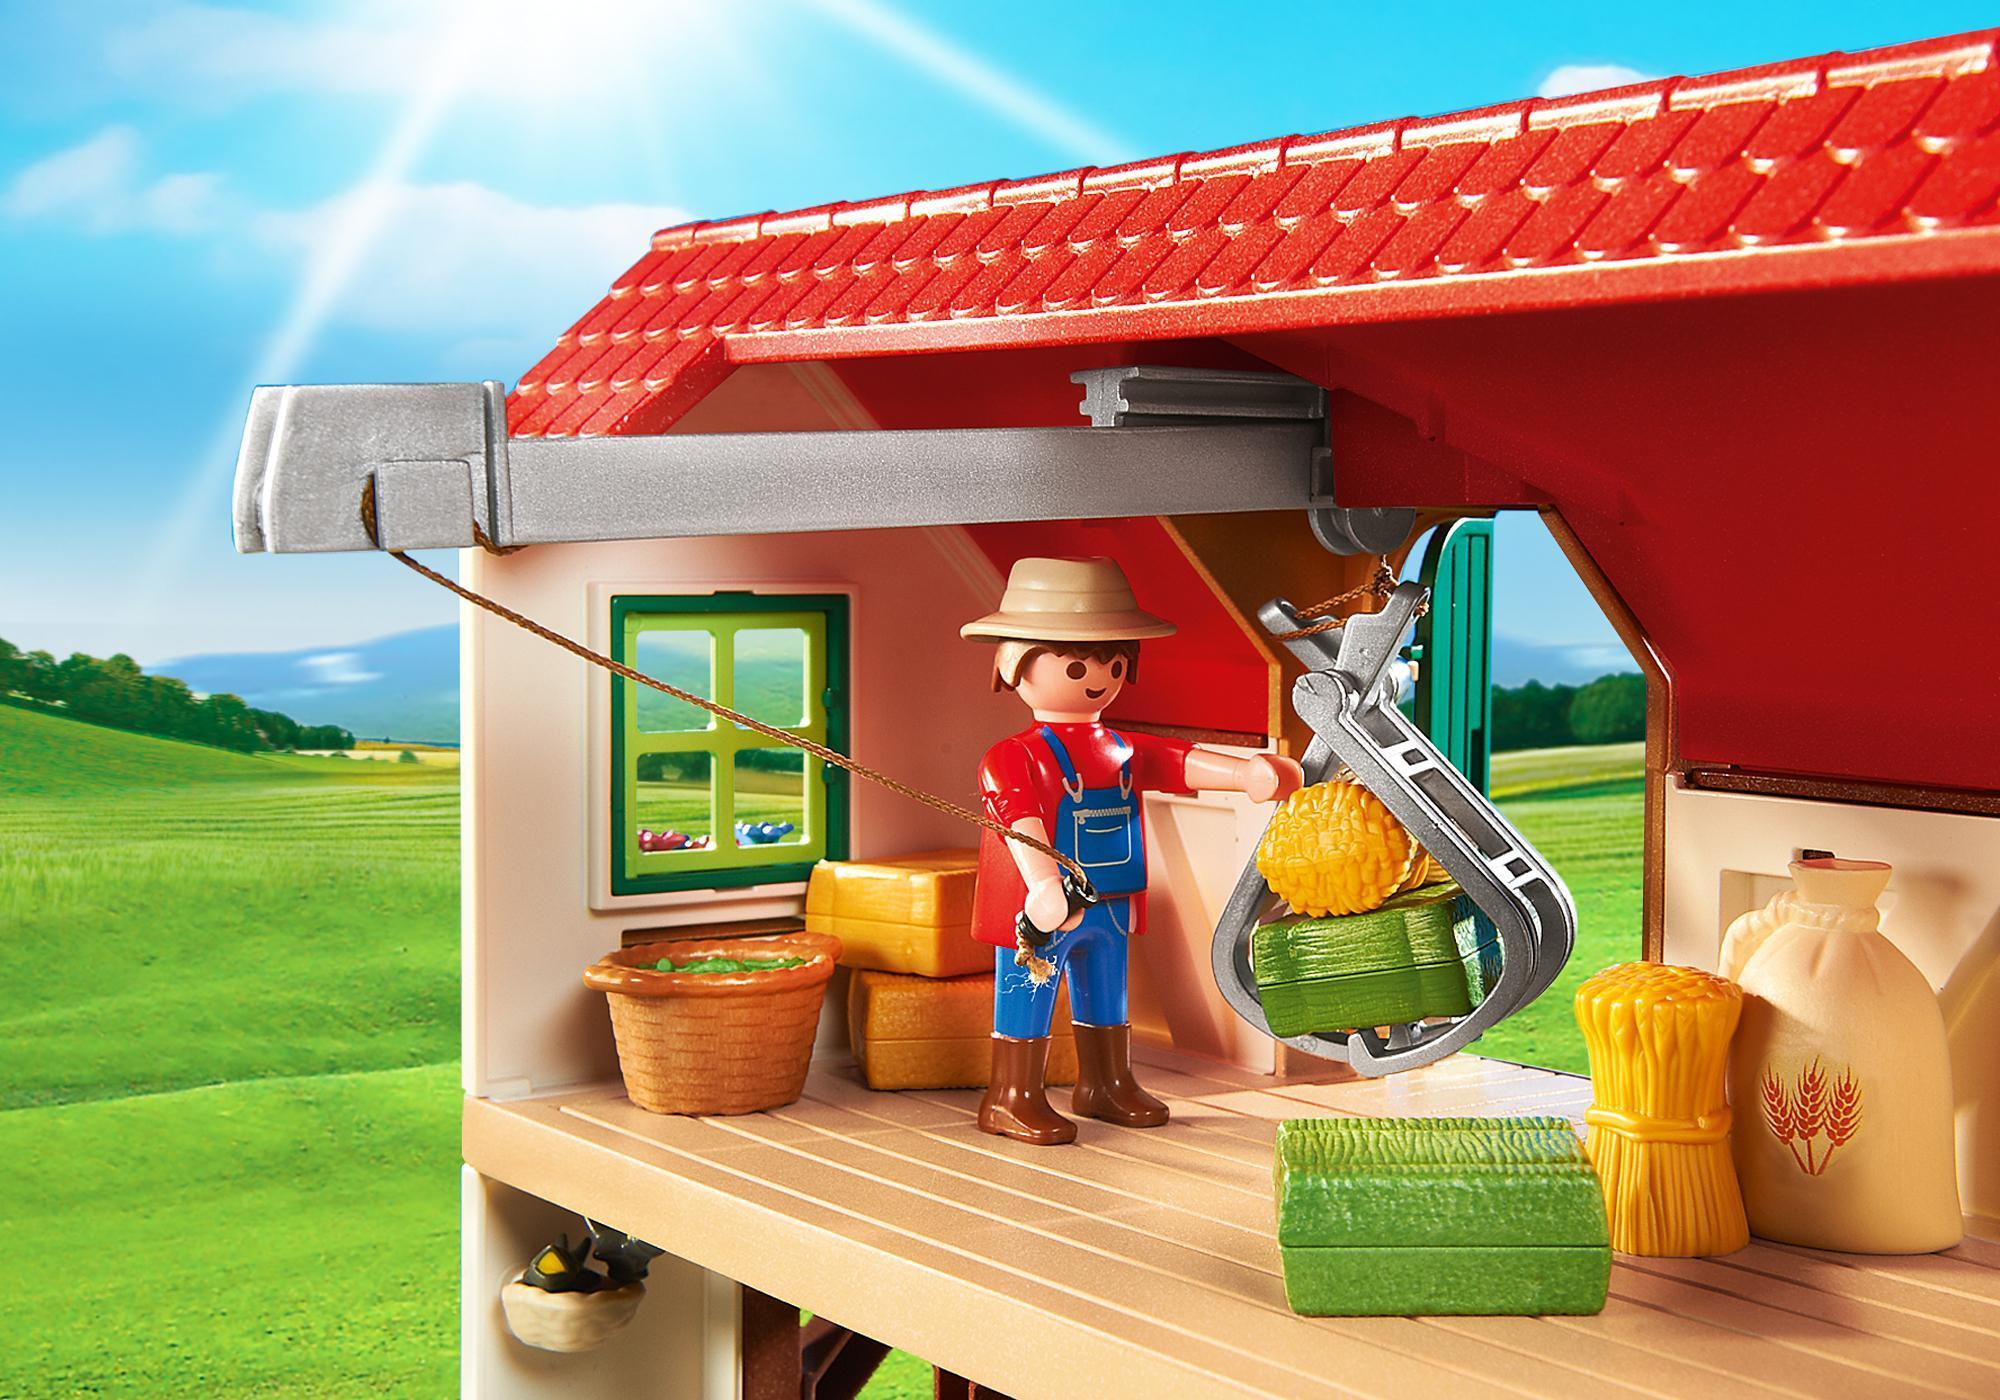 http://media.playmobil.com/i/playmobil/6120_product_extra3